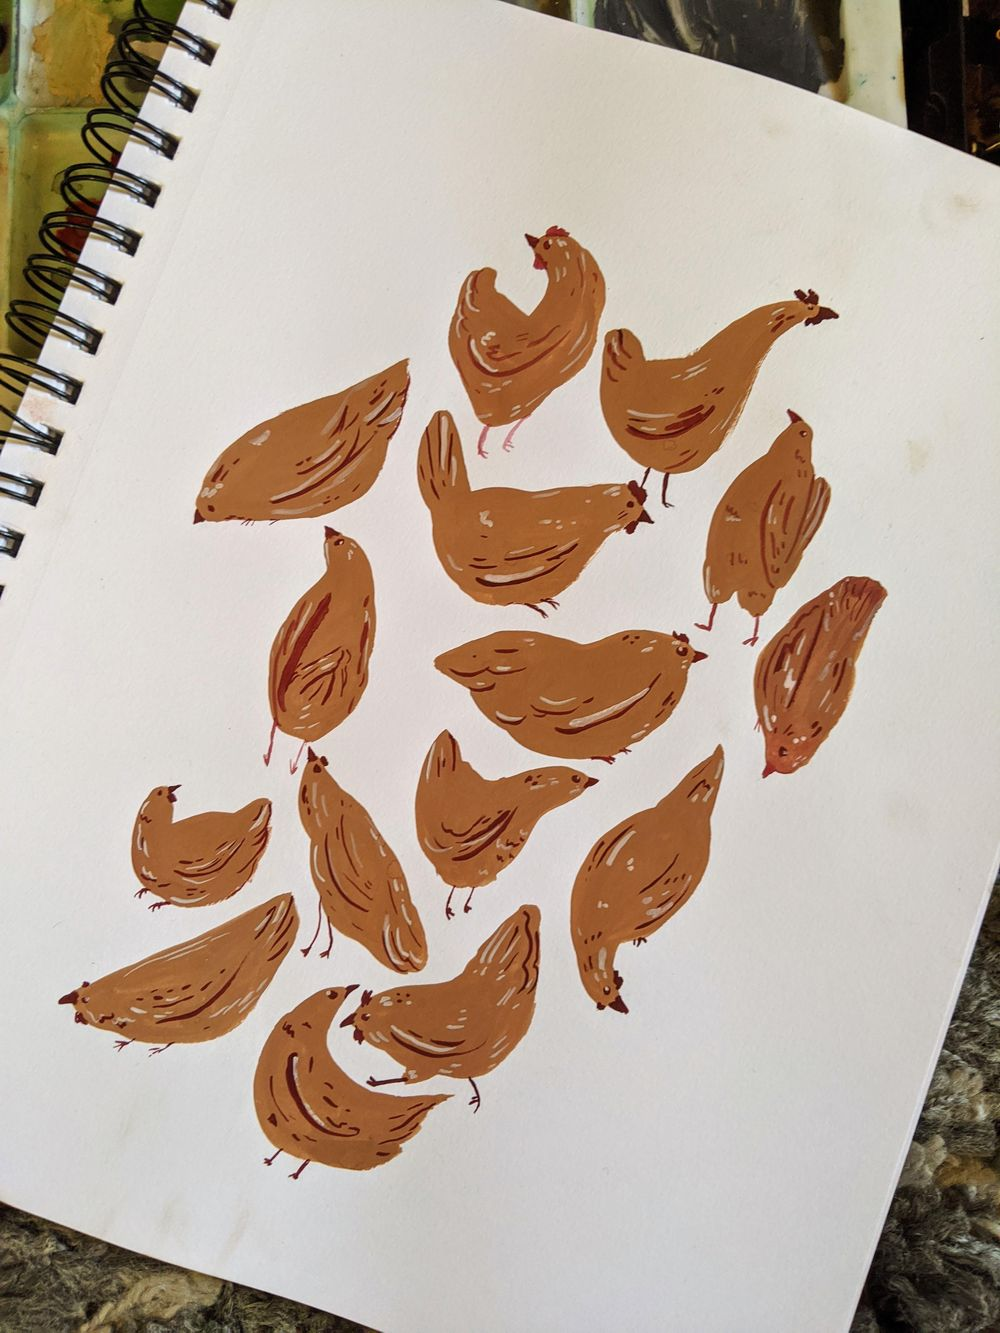 Sketchbook practice - image 1 - student project